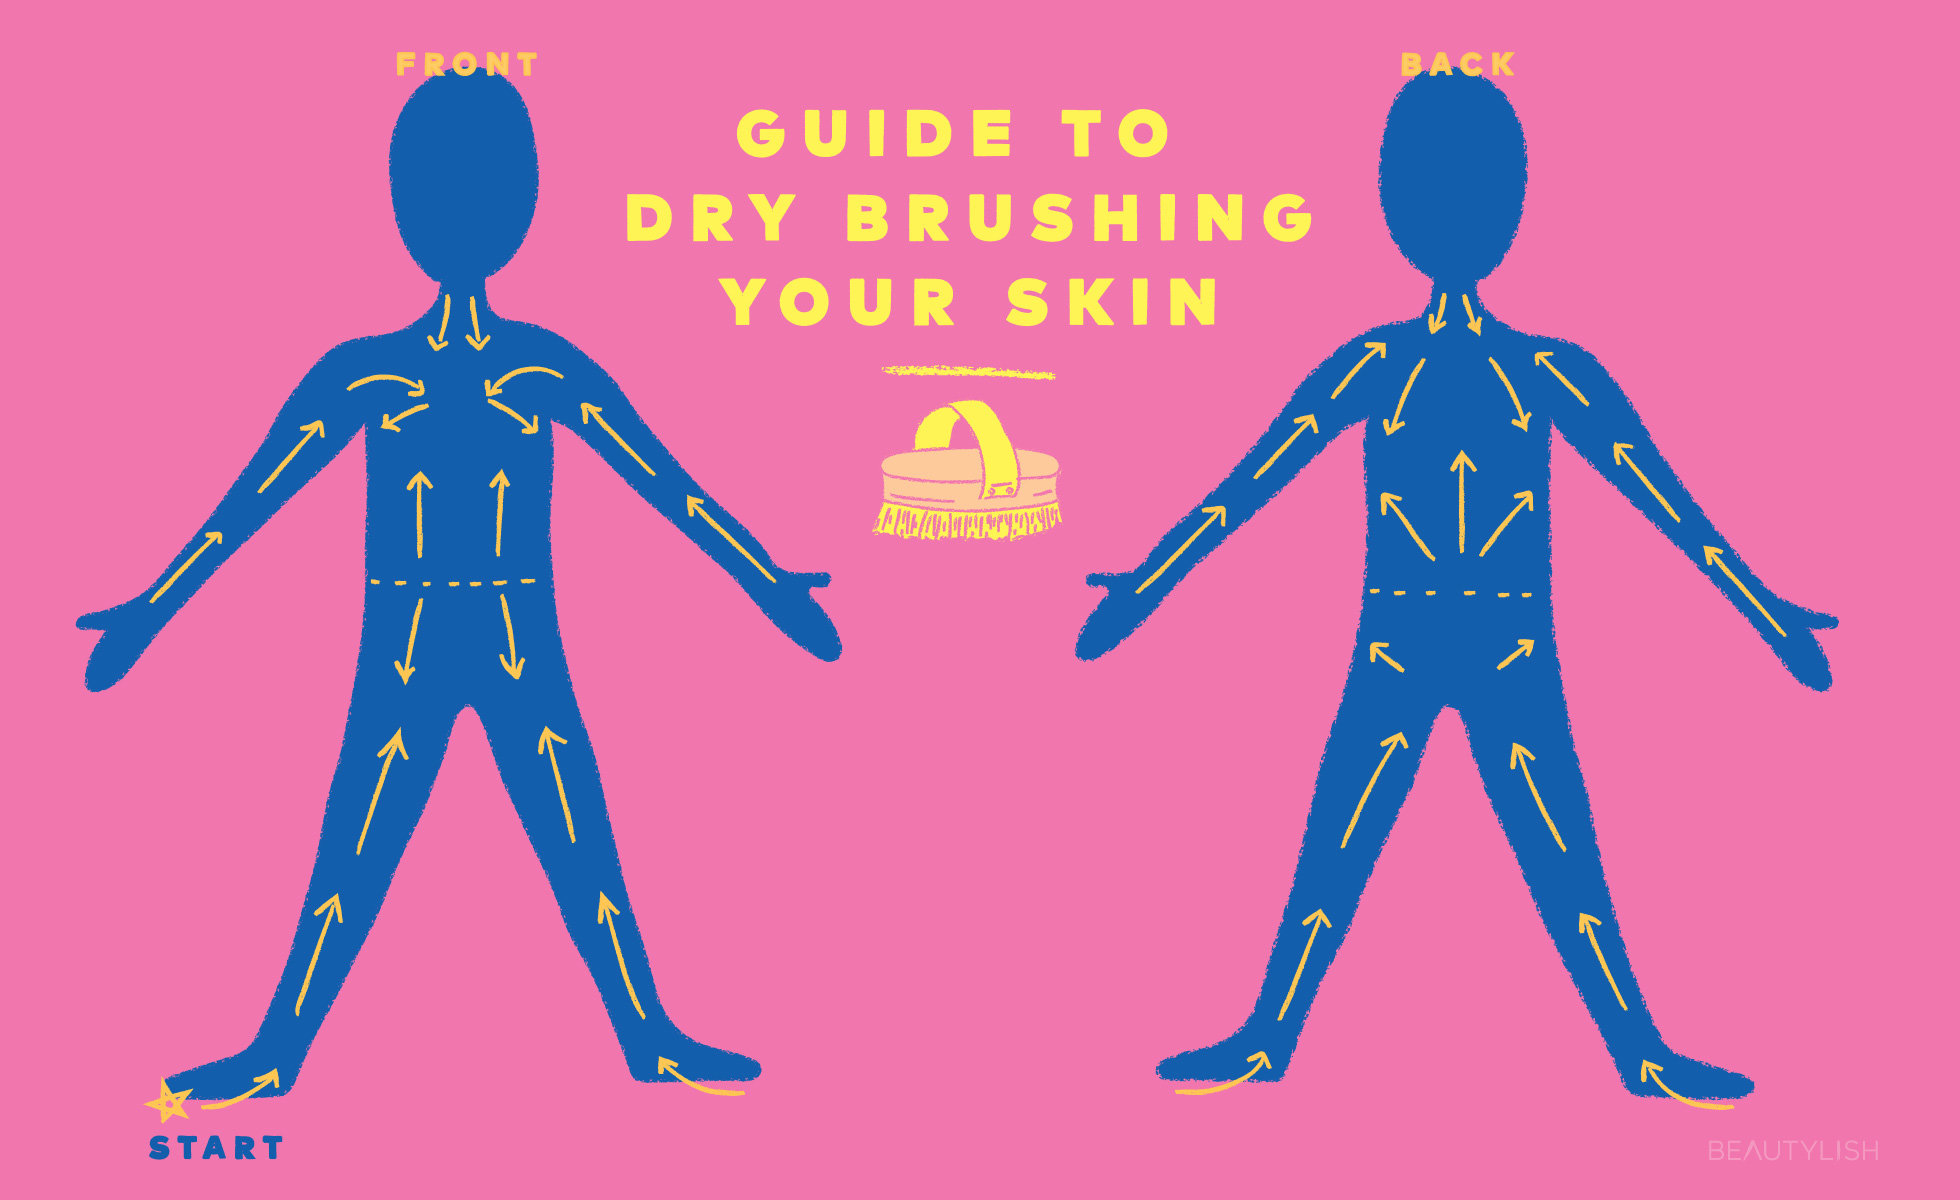 Guide to Dry Brushing Your Skin | Beautylish